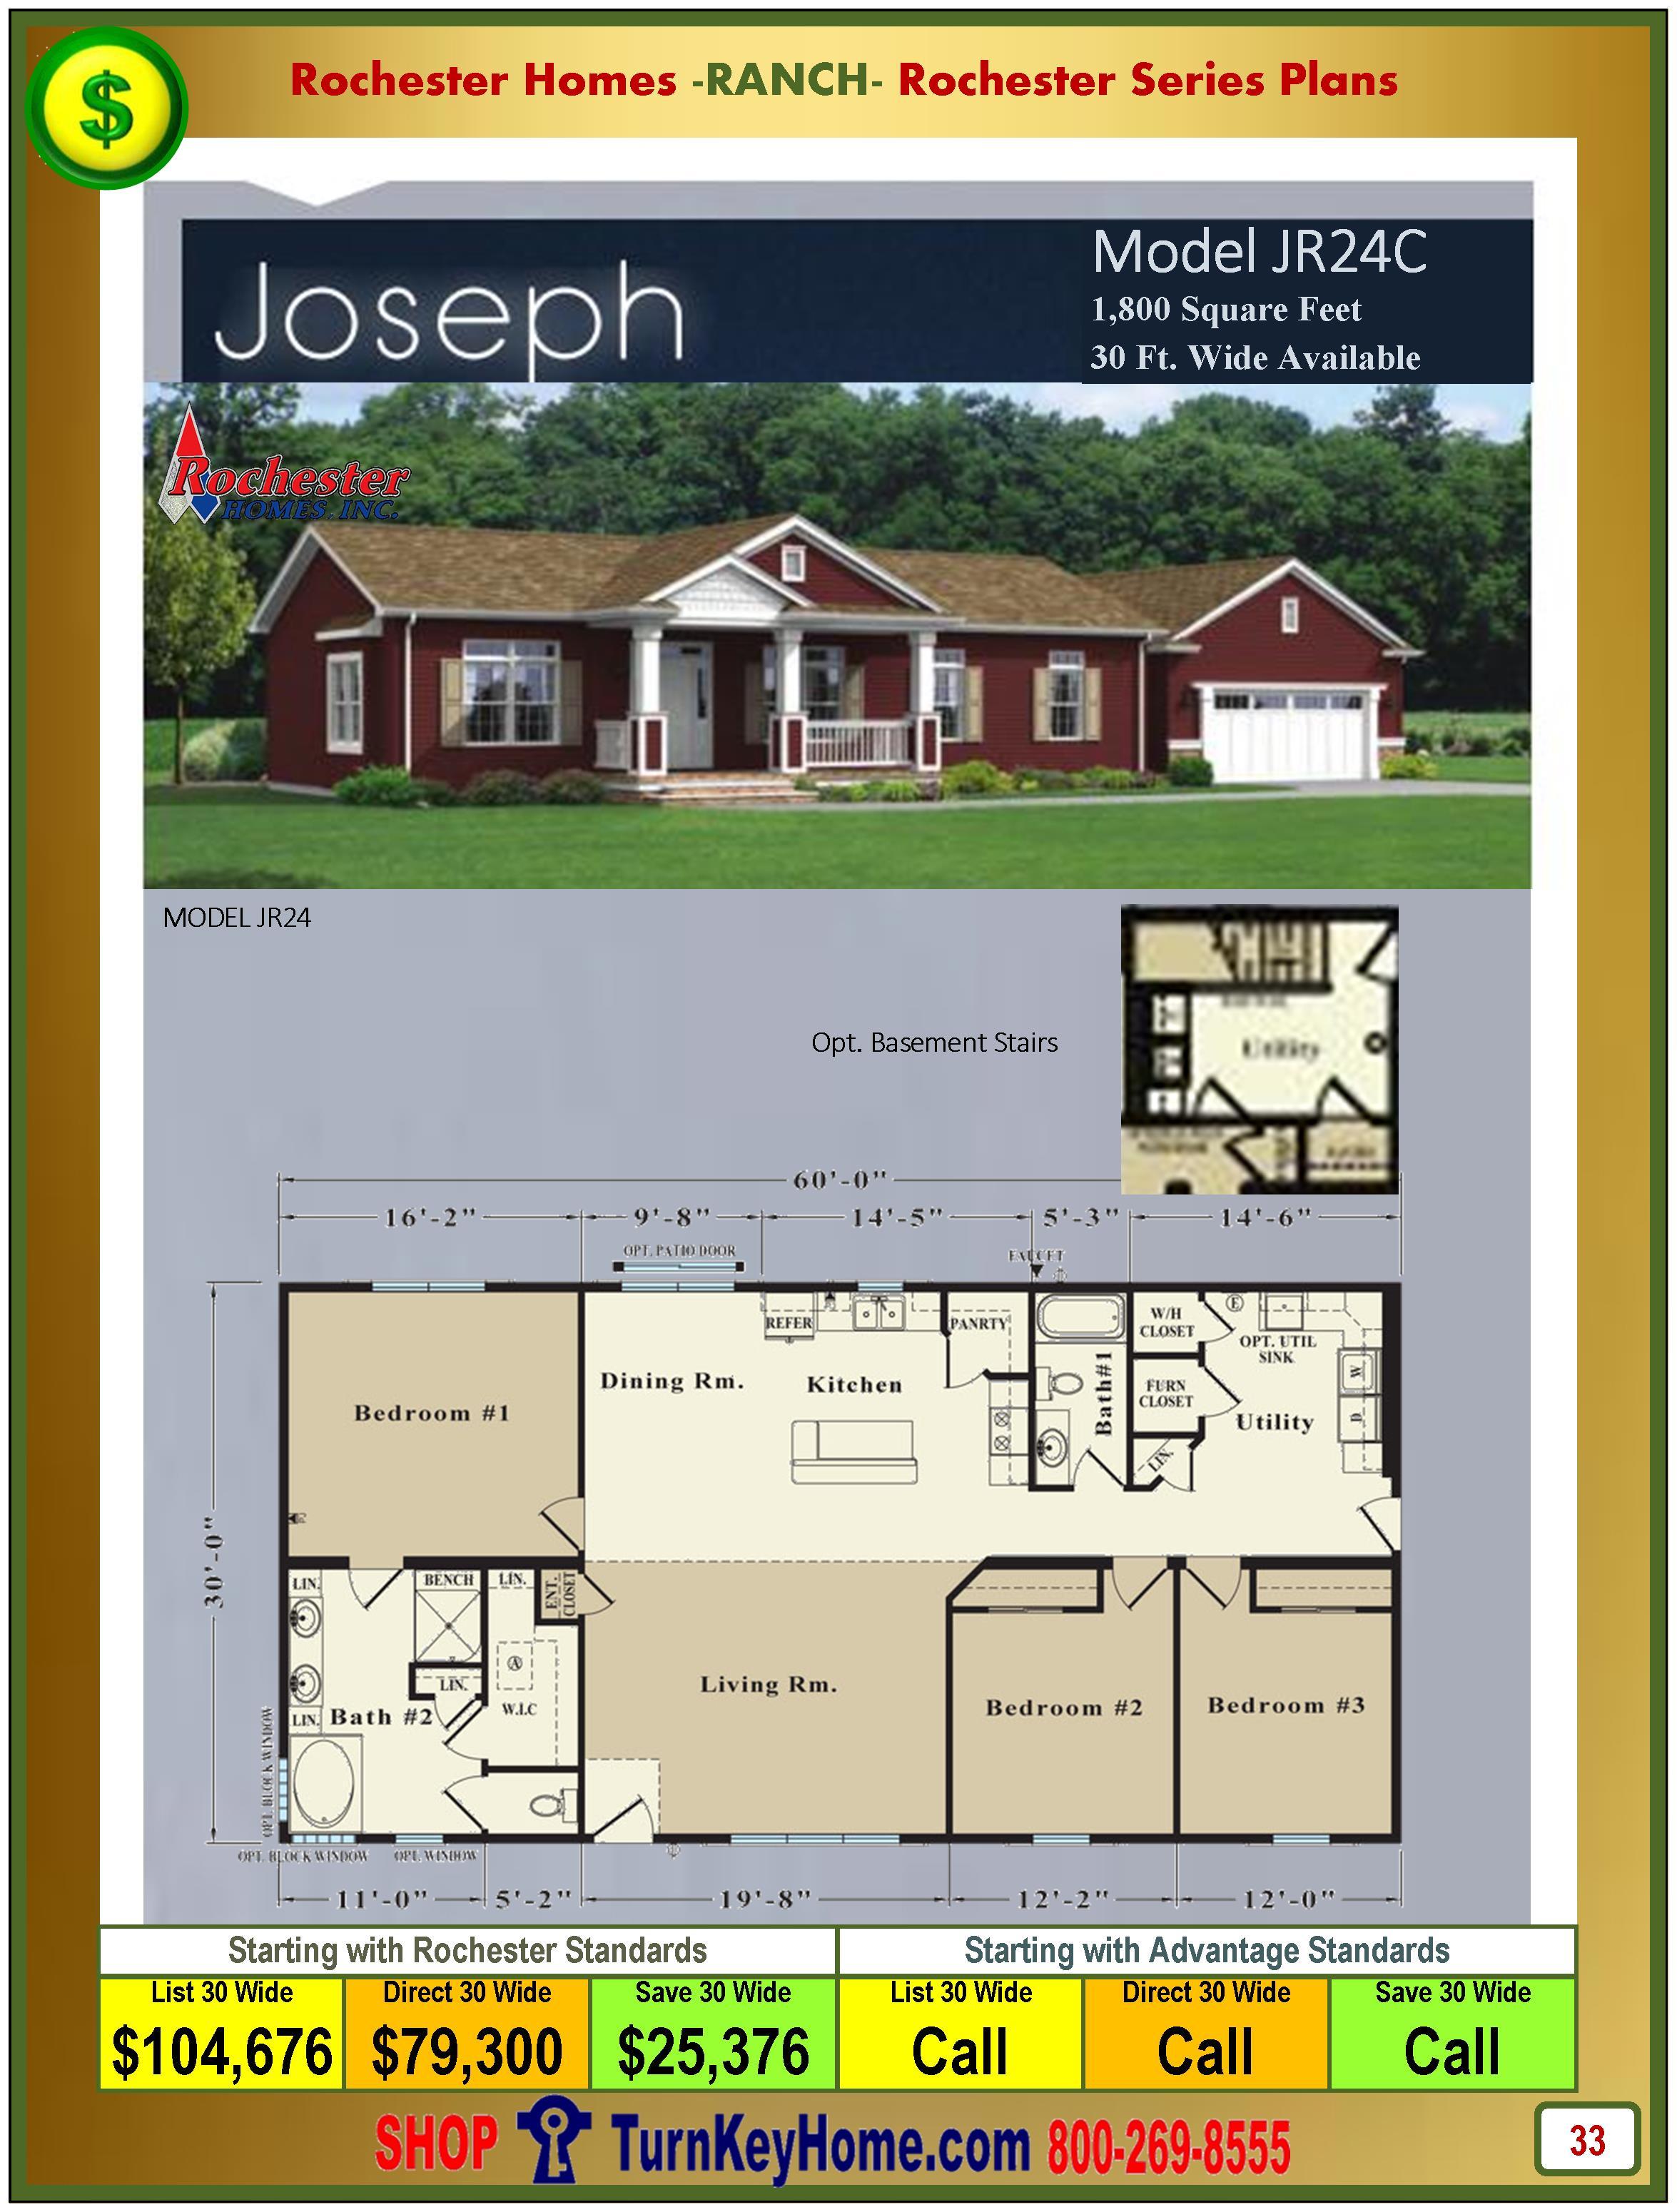 Modular.Homes.Rochester.Home.Inc.Joseph.JR24C.Ranch.Plan.Price.Catalog.P33.1215